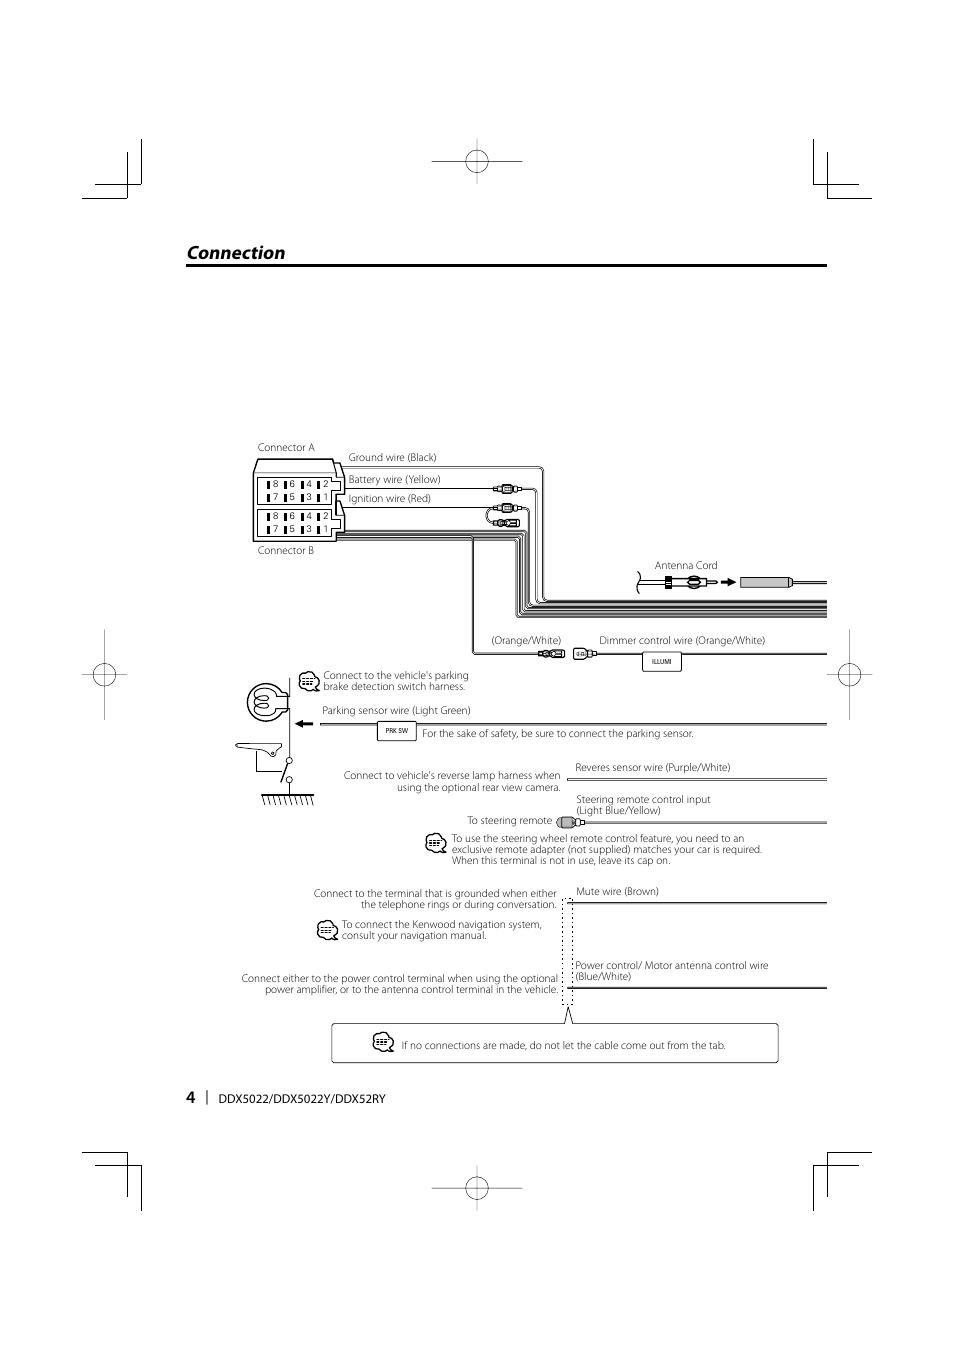 Kenwood Ddx 5022 Manual One Word Quickstart Guide Book Ddx512 Wire Harness Connection Ddx5022 User Page 4 12 Rh Manualsdir Com Ddx319 Ddx370